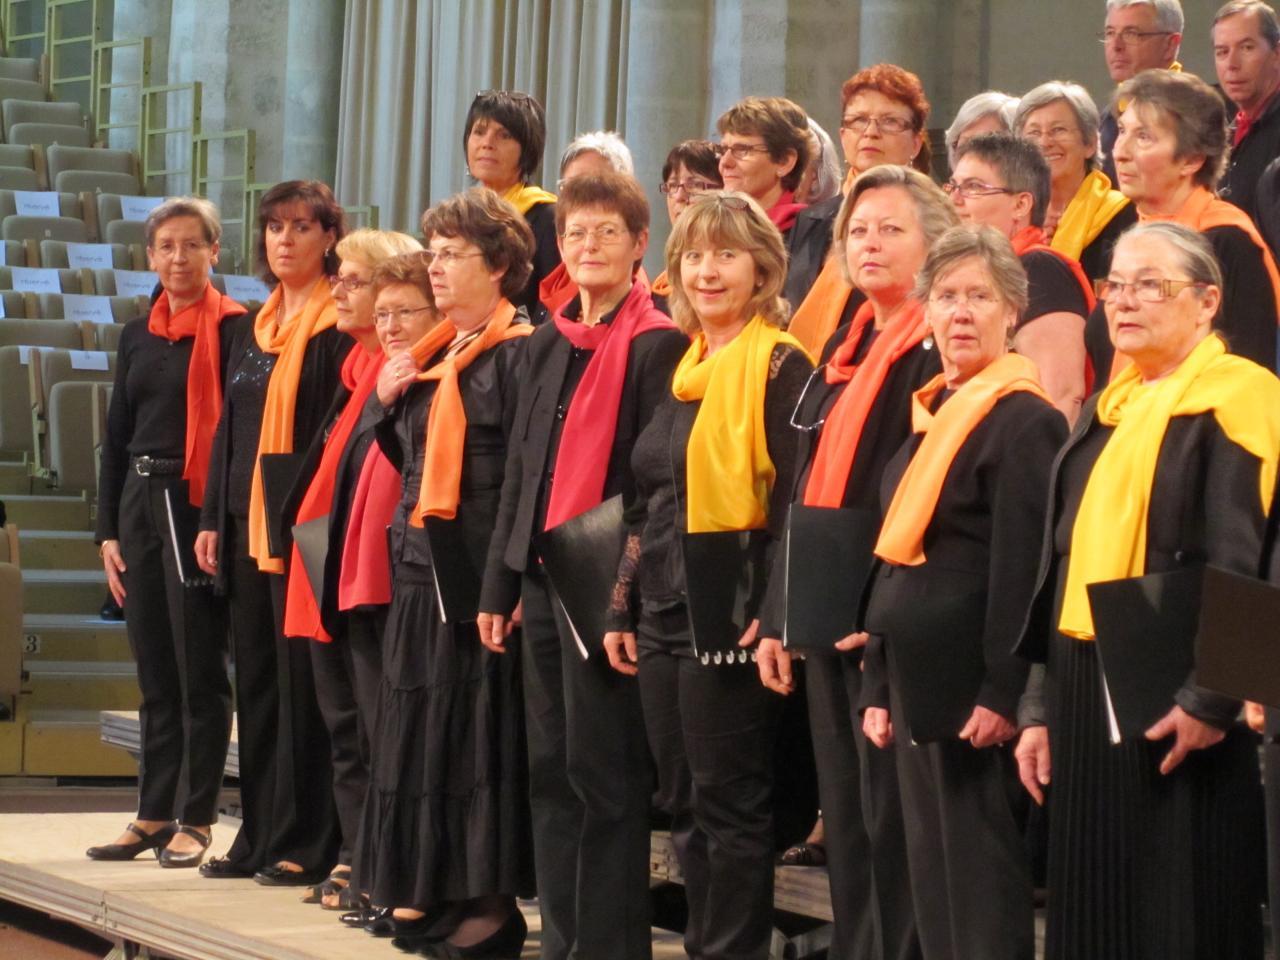 Harmonia mai 2012 - Chaîne chorale à l'abbaye de l'Epau